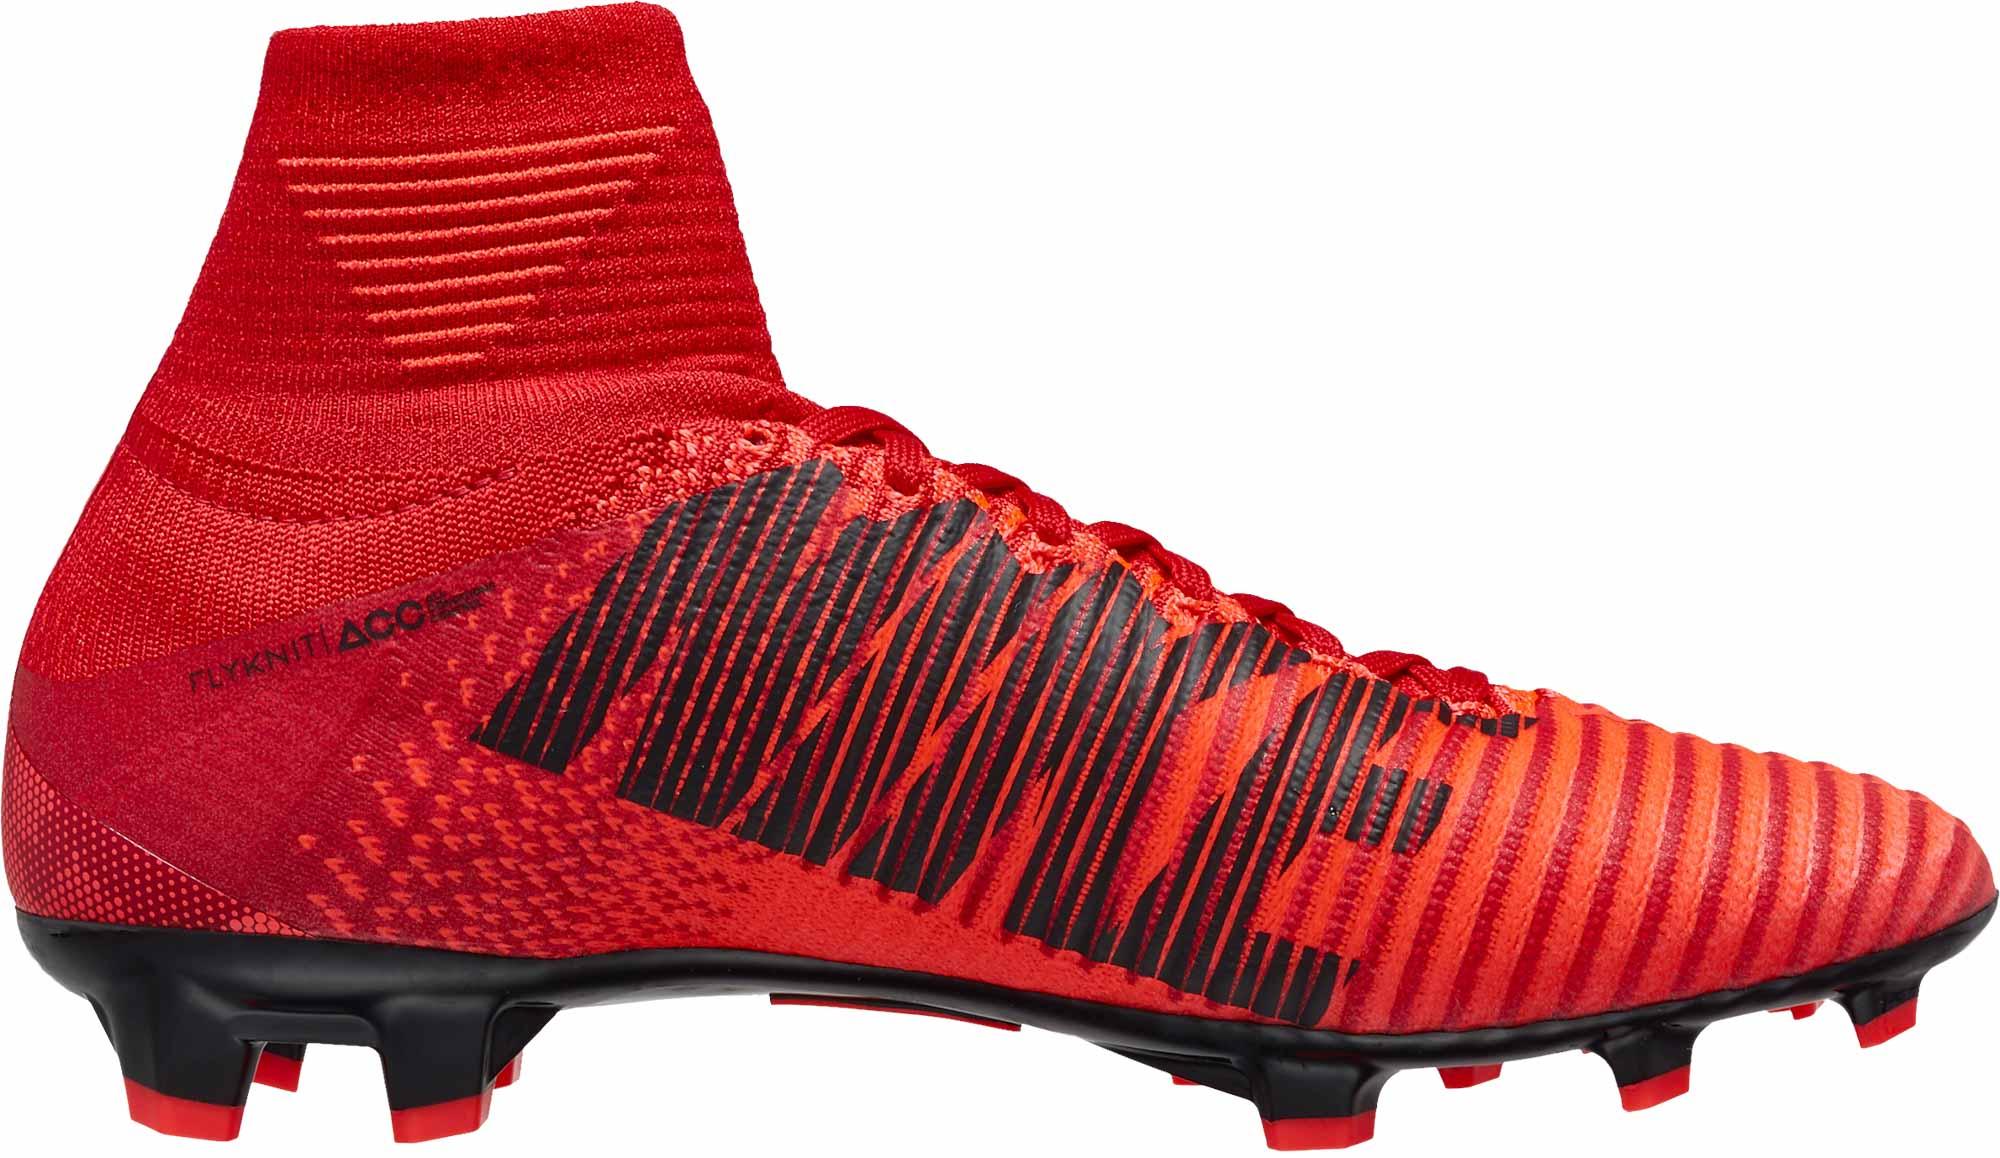 Nike Kids Mercurial Superfly V FG – University Red/Black